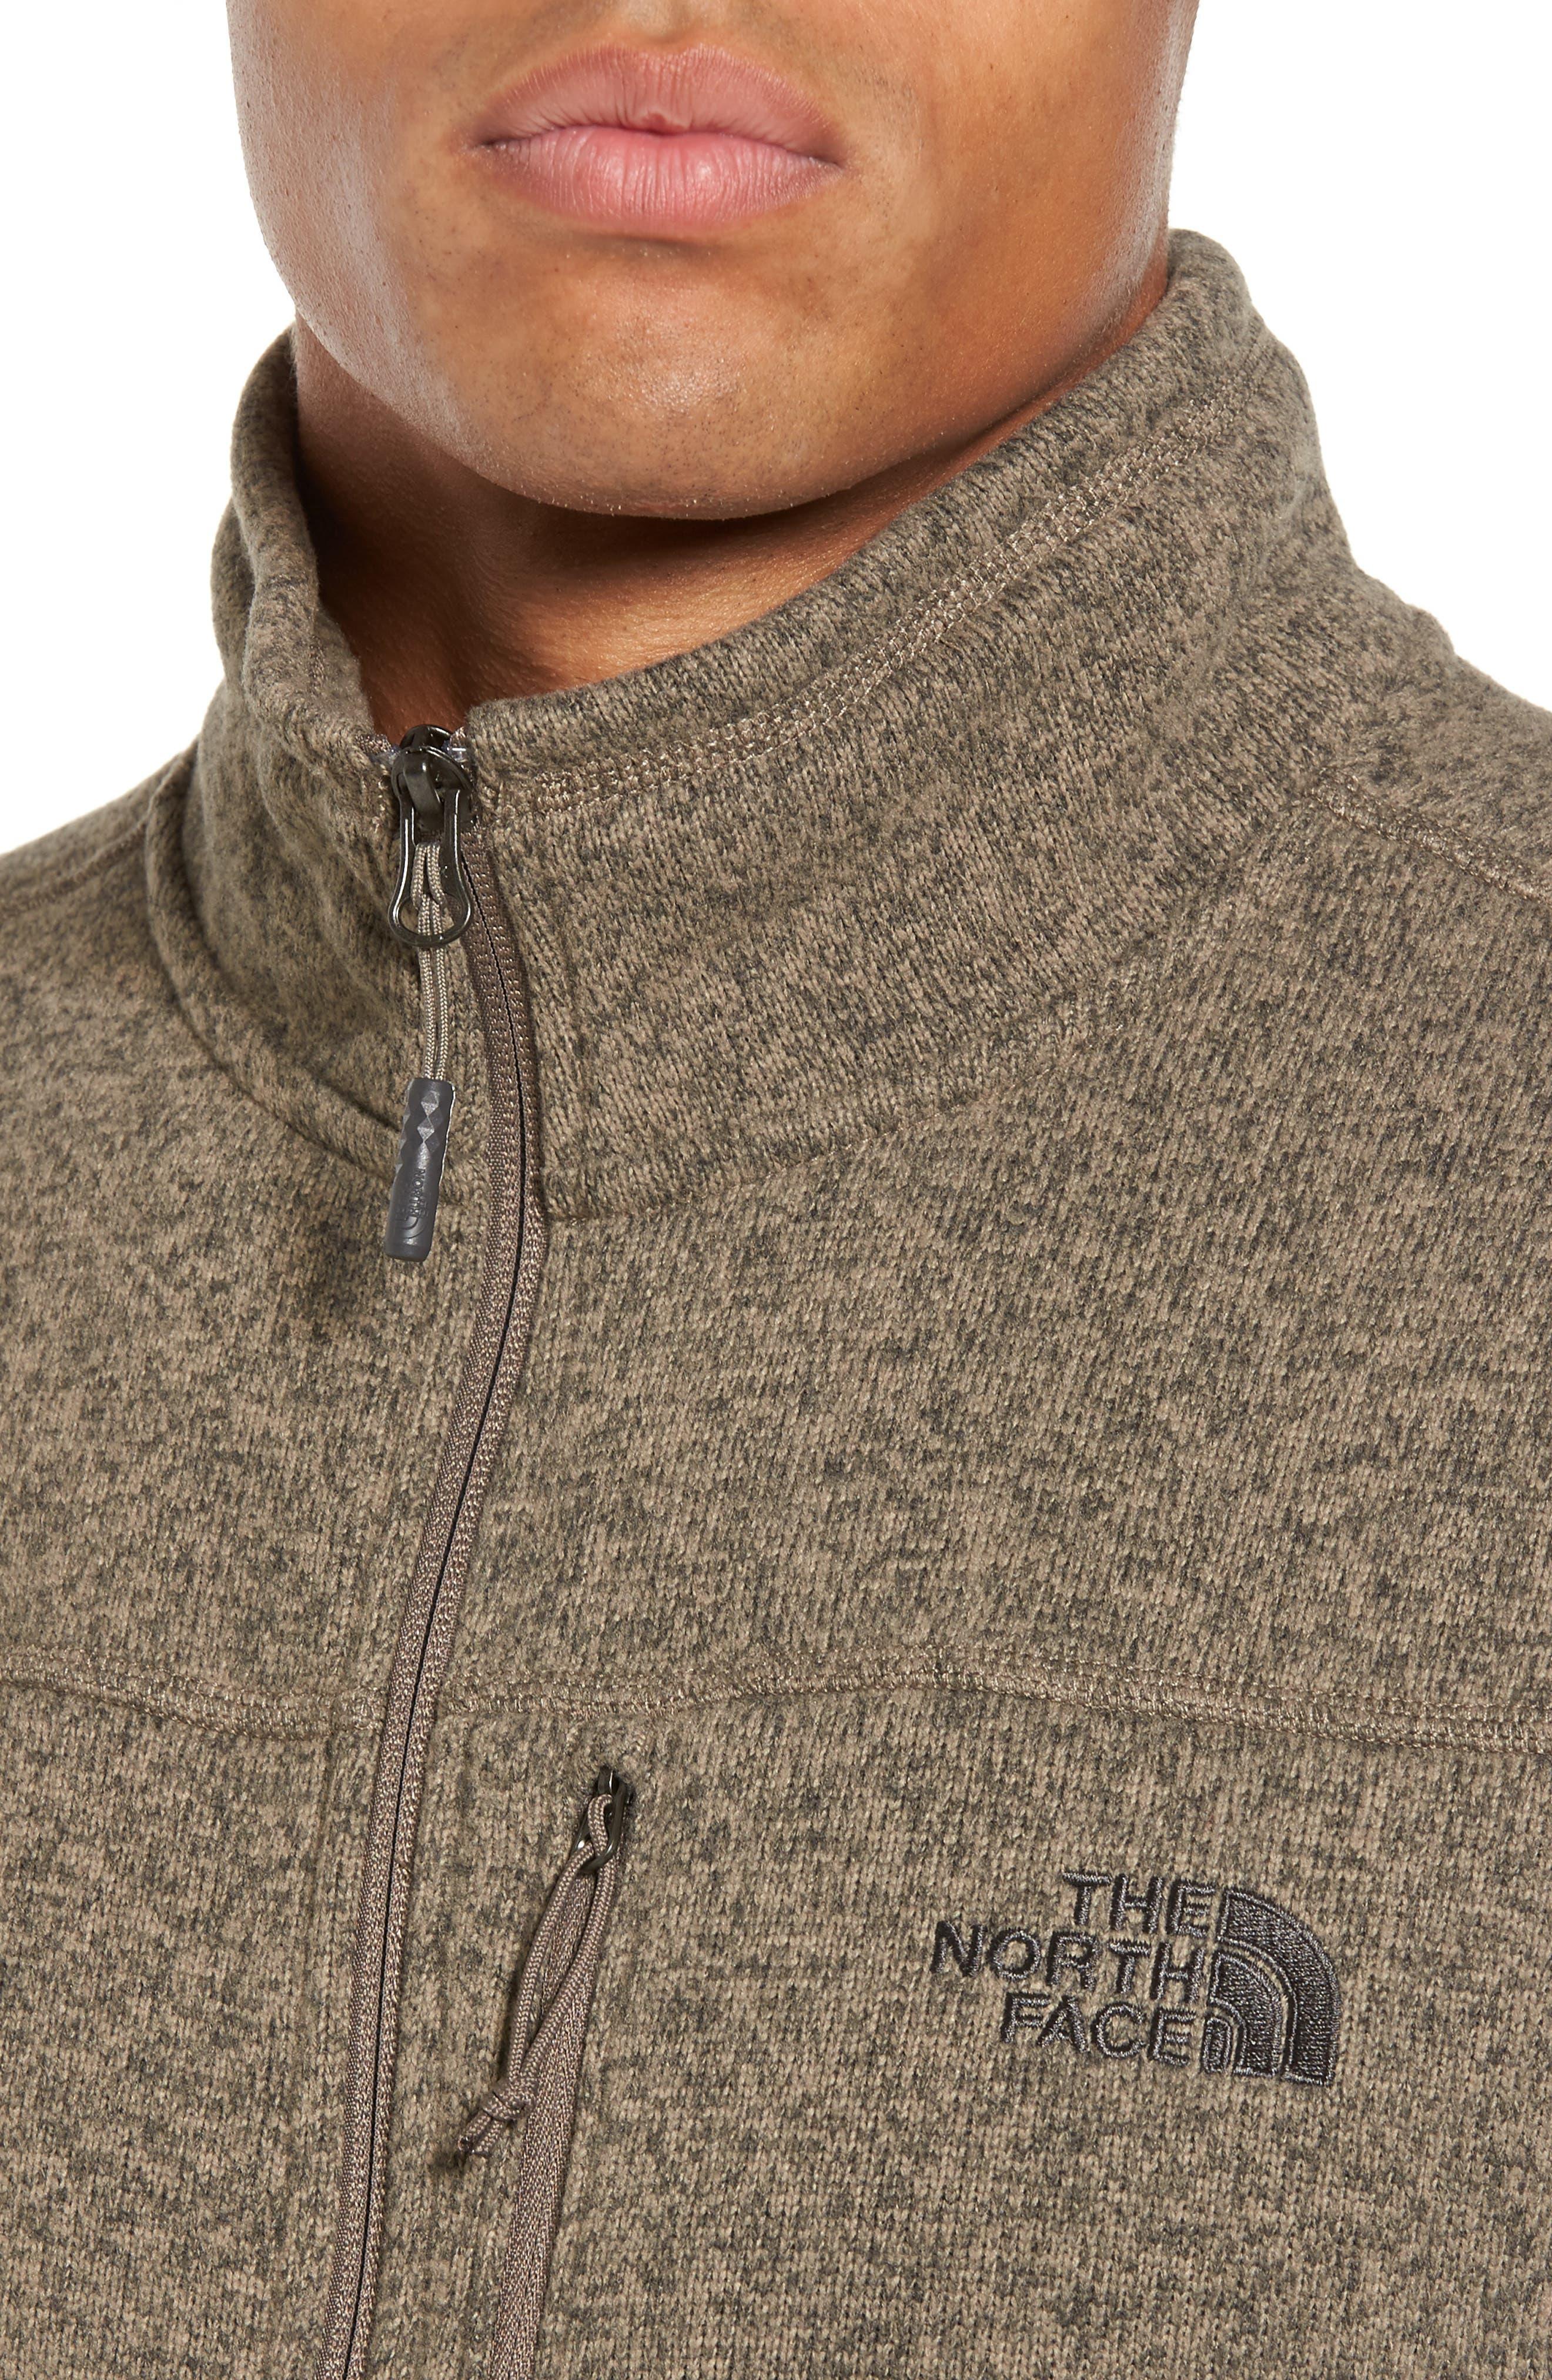 Gordon Lyons Zip Fleece Vest,                             Alternate thumbnail 18, color,